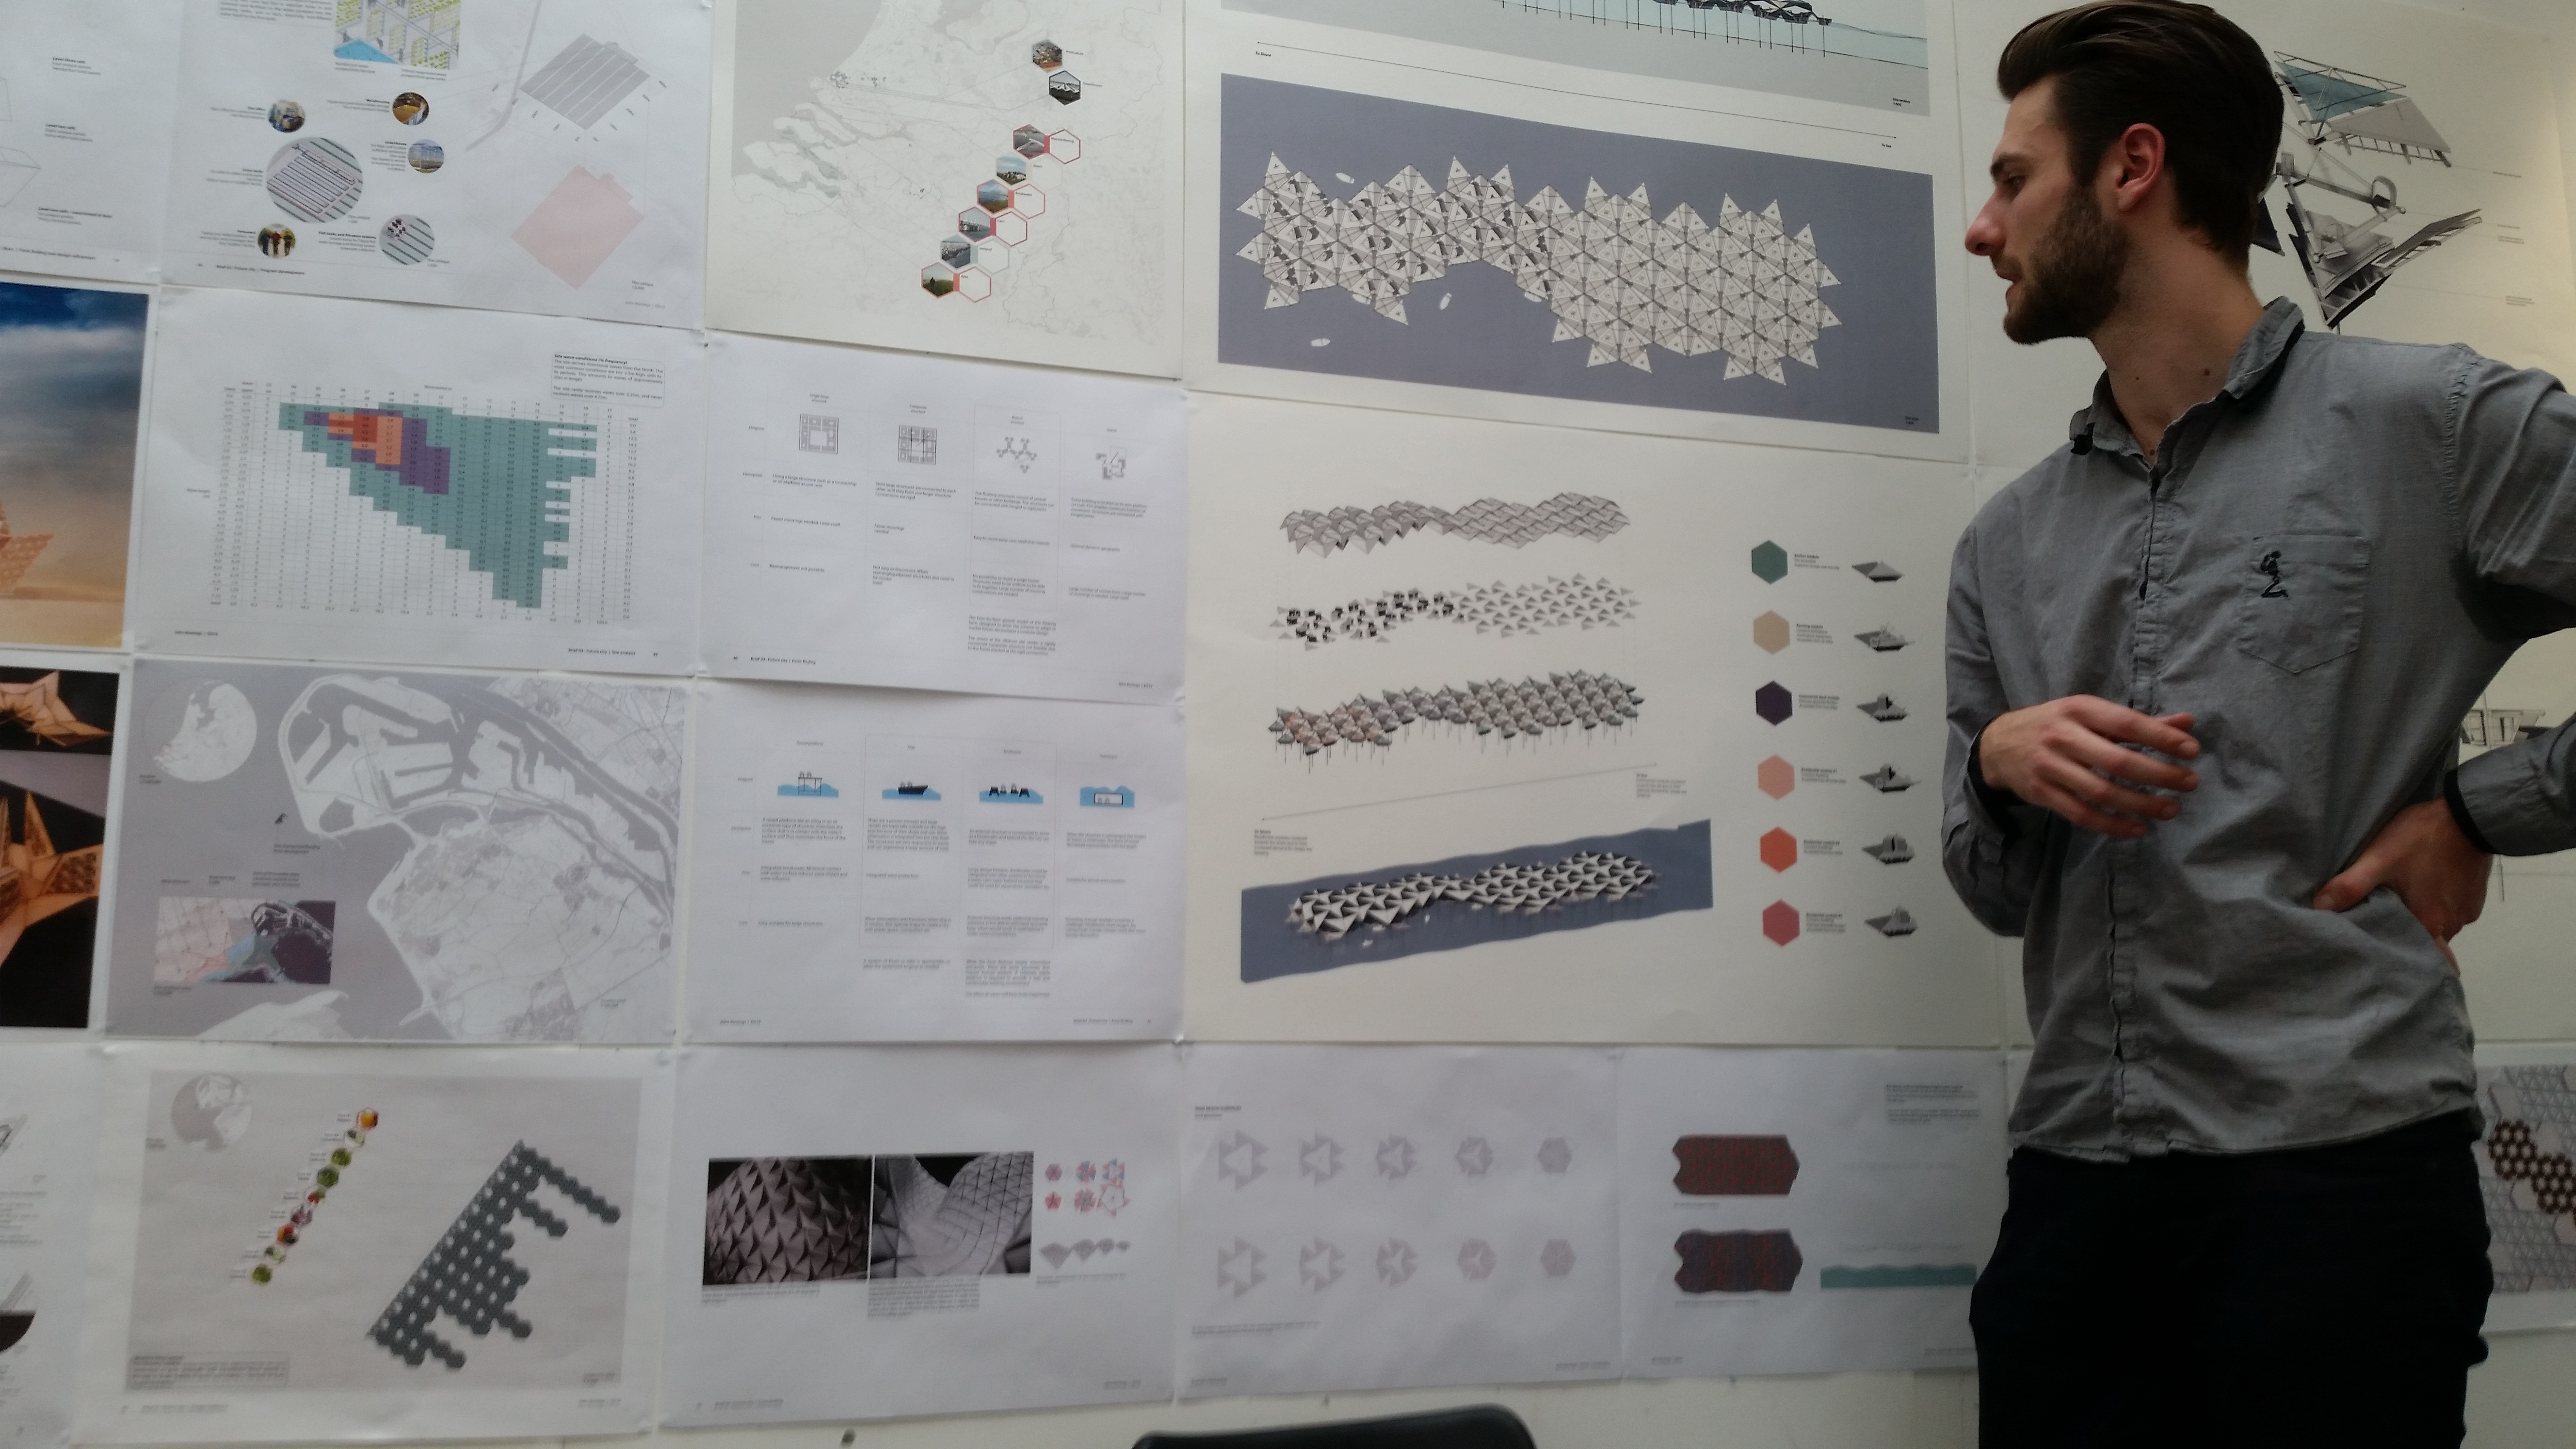 John Koning's power generating Ron Resch origami city